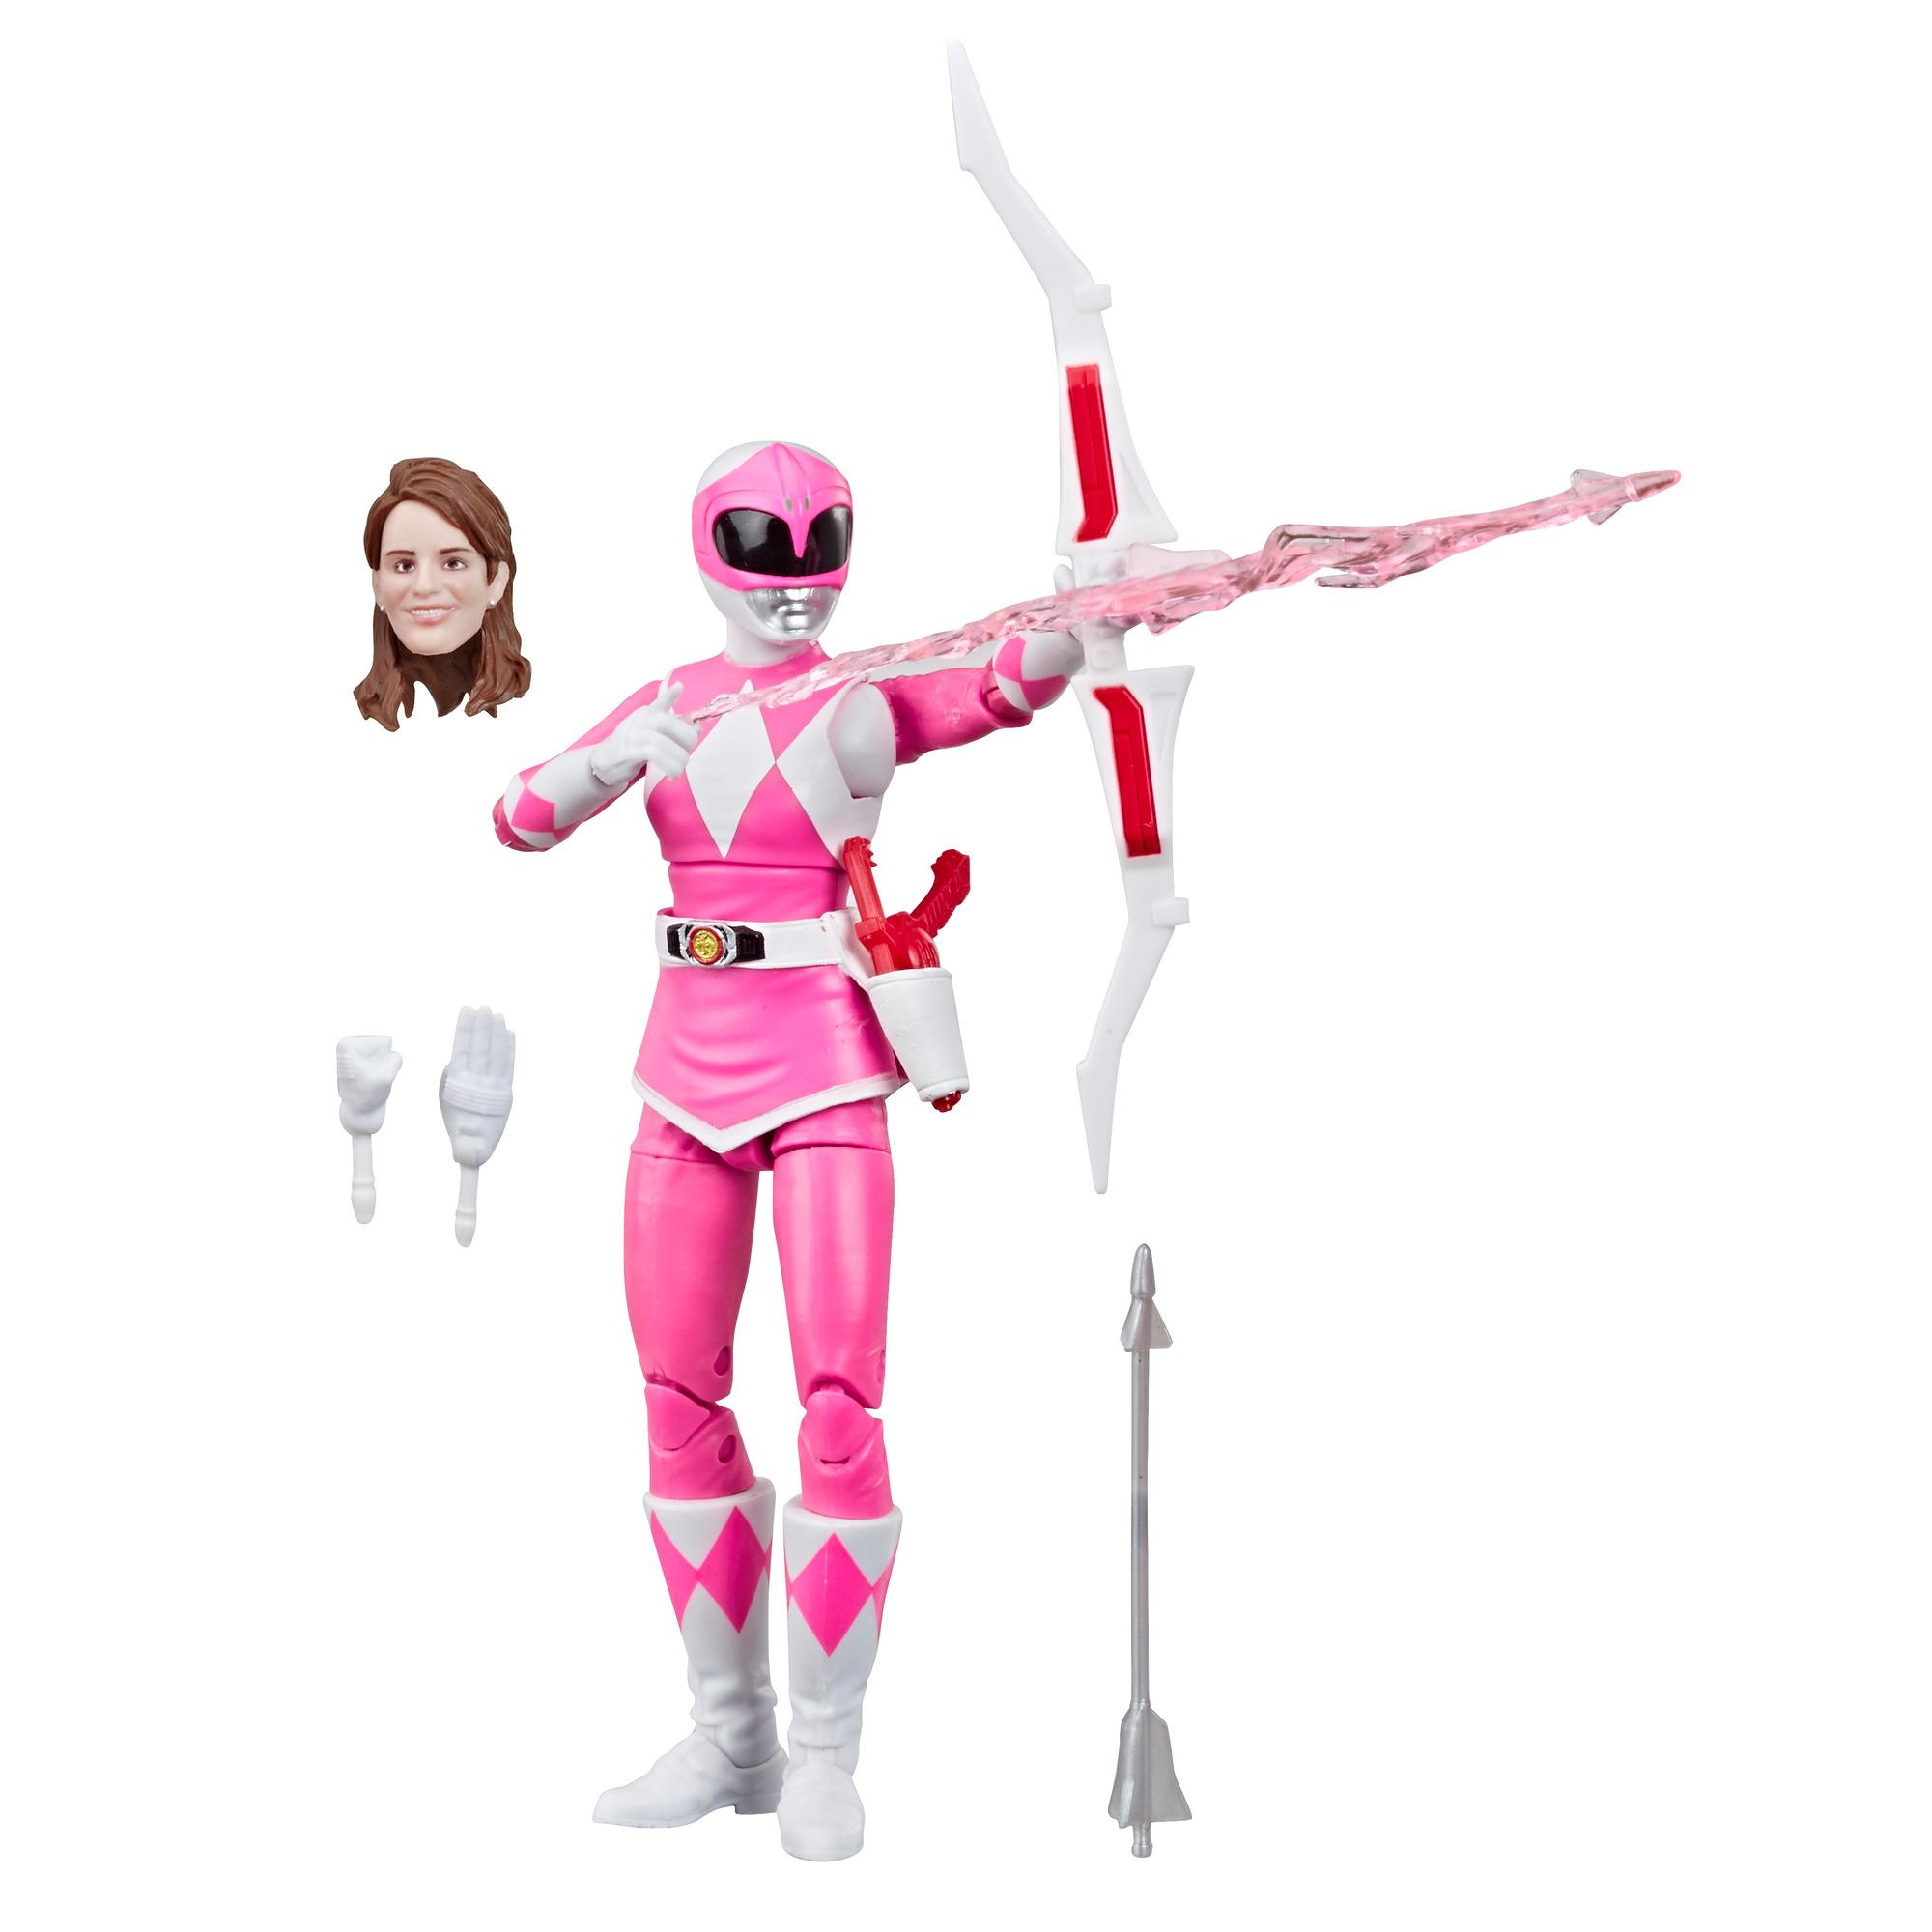 Ranger power rangers pink Power Rangers